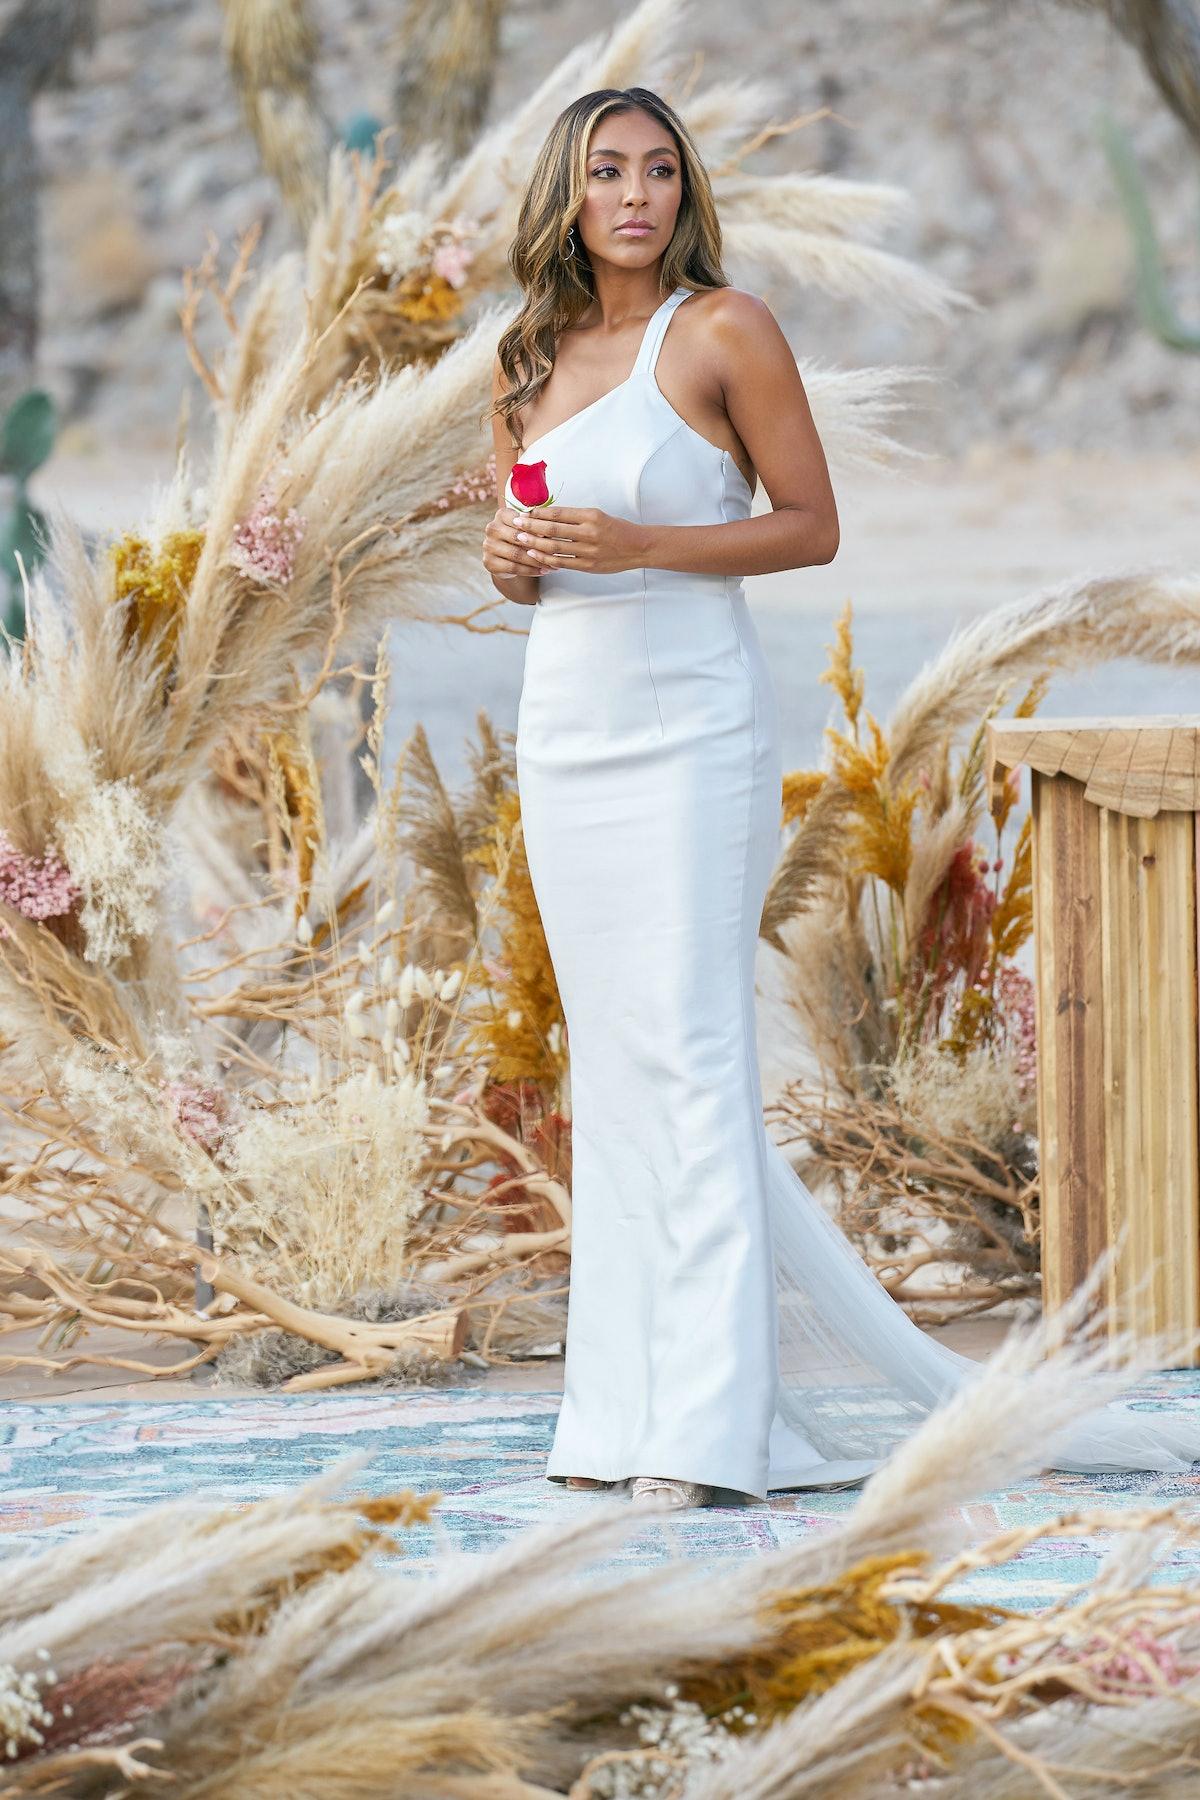 Tayshia on 'The Bachelorette'